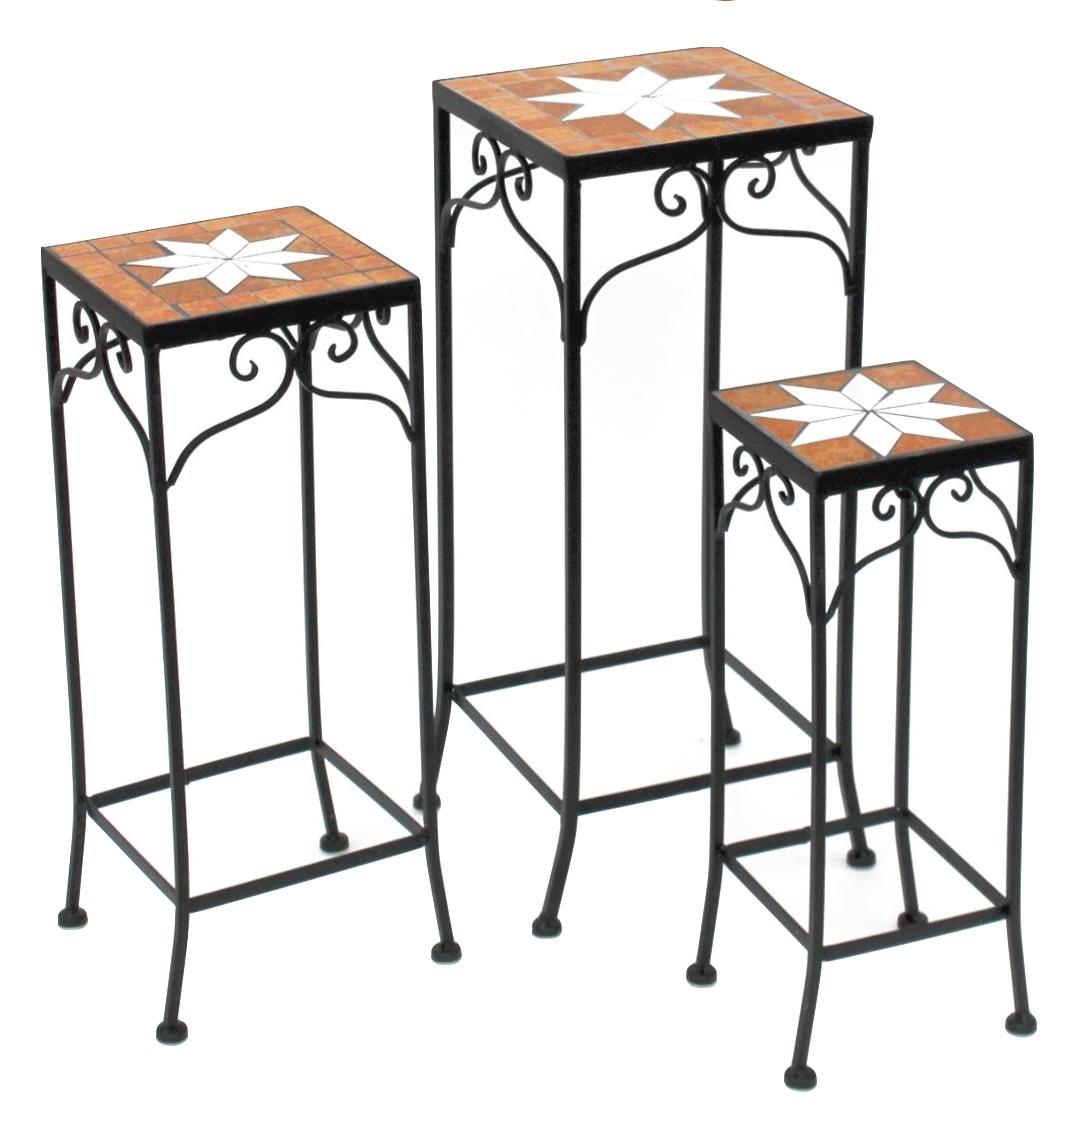 DanDiBo Stool Merano Mosaic 12012 Flower stand 46 Stool square Side table